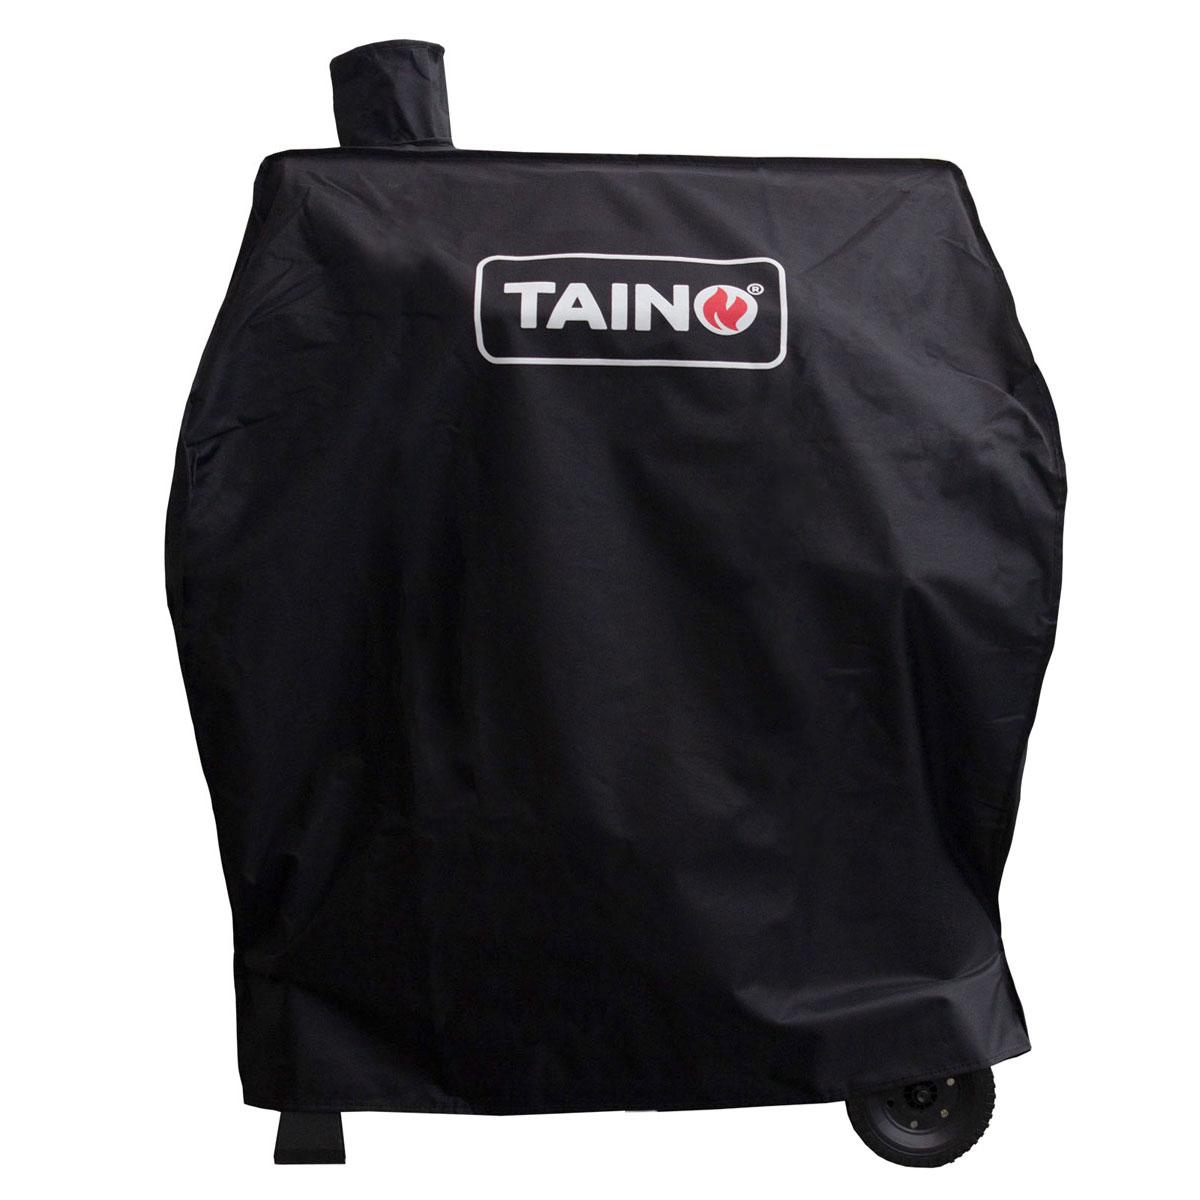 98886 Abdeckung TAINO HERO XXL